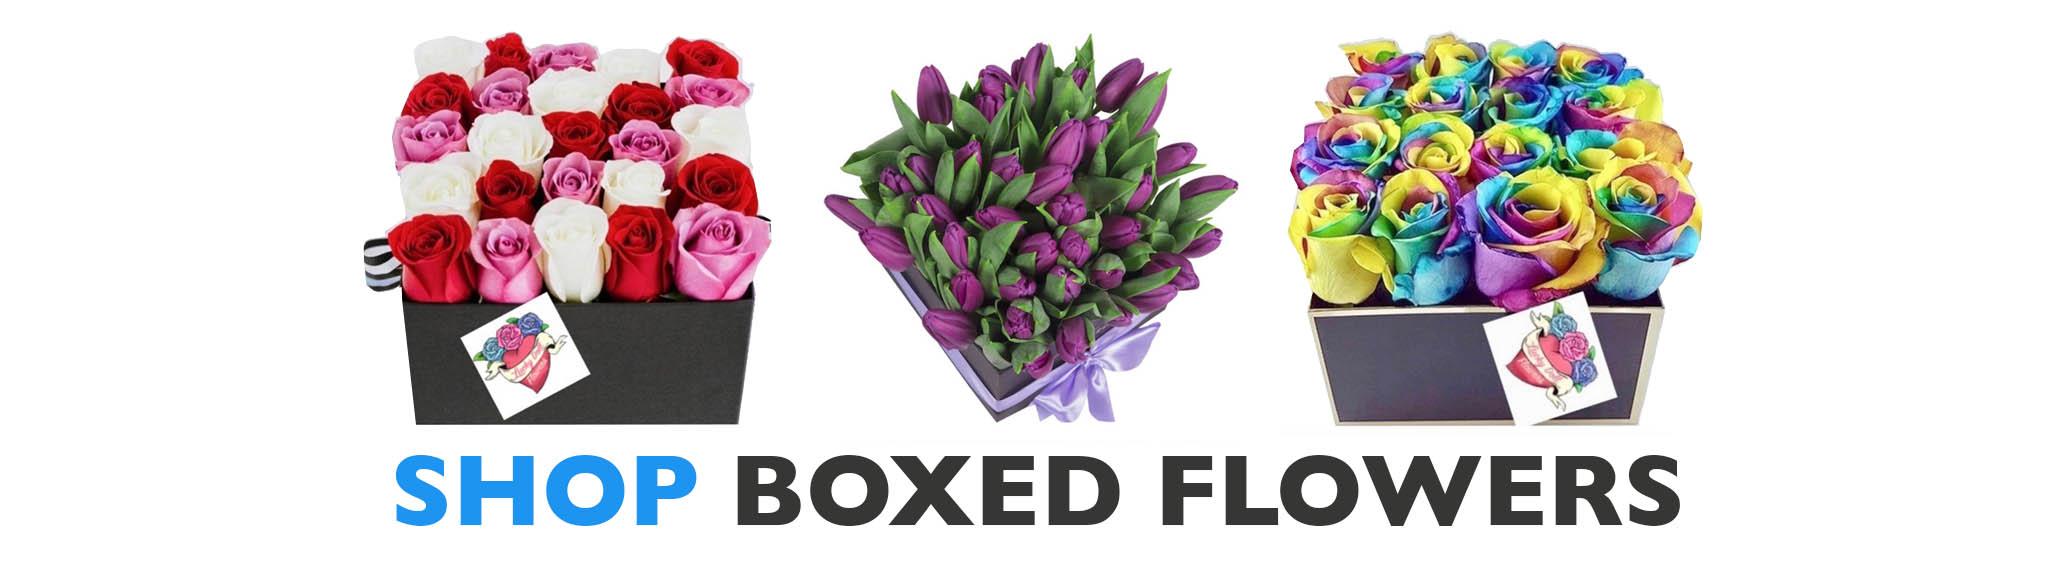 Online Shop Flowers Delivery Manilaphilippines Send Same Day